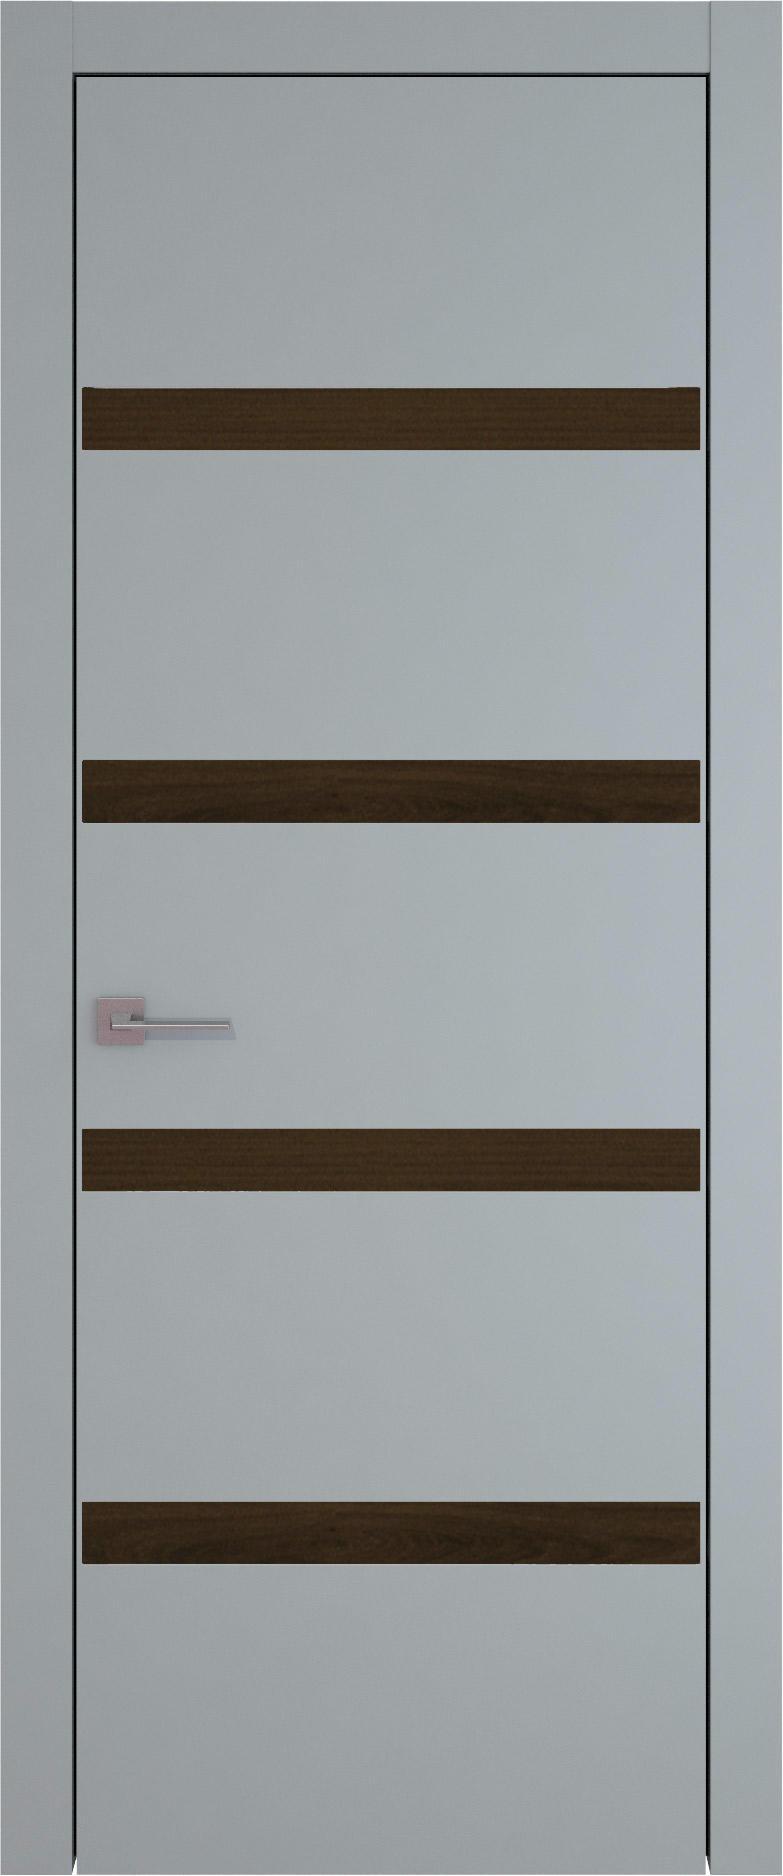 Tivoli Д-4 цвет - Серебристо-серая эмаль (RAL 7045) Без стекла (ДГ)